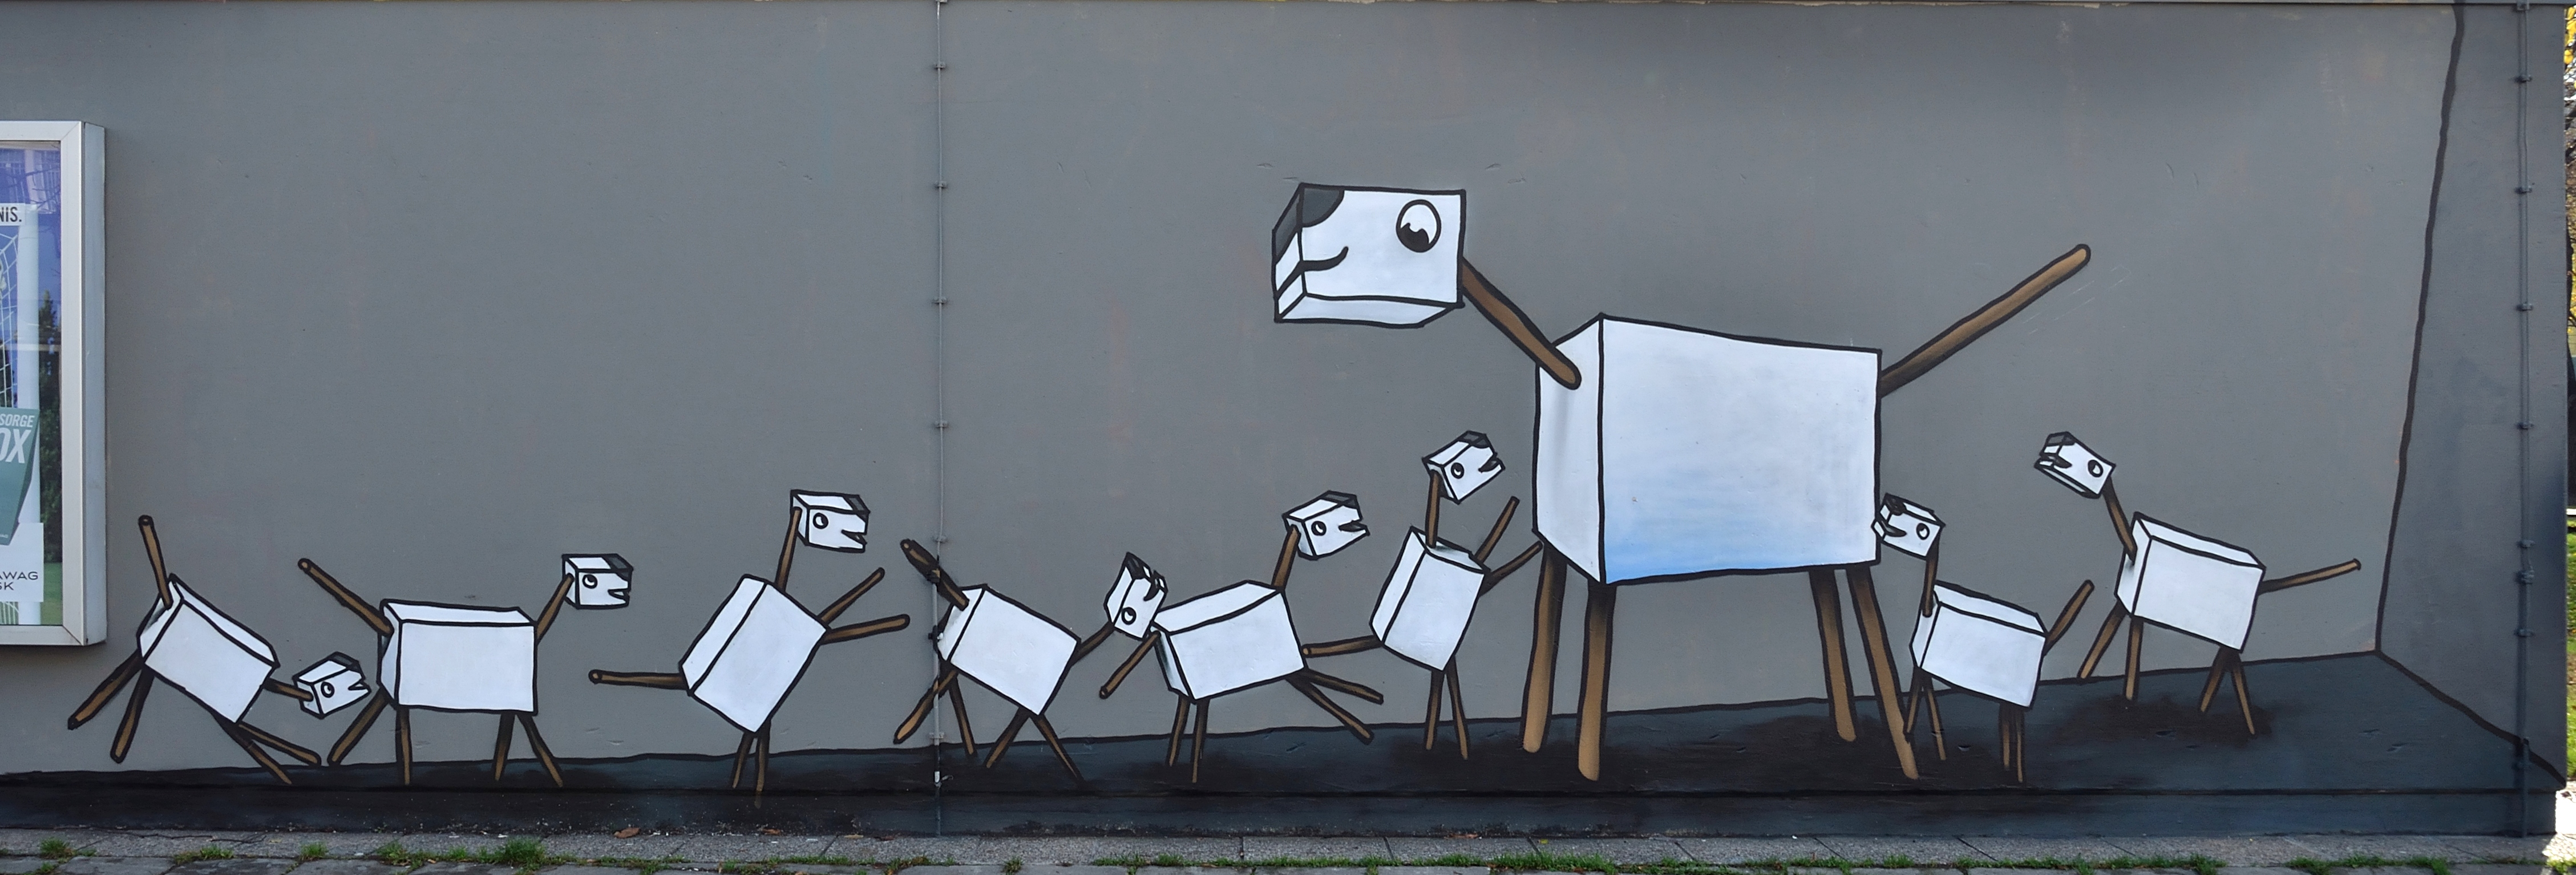 Filegraffiti bruno kreisky park 03 vienna jpg